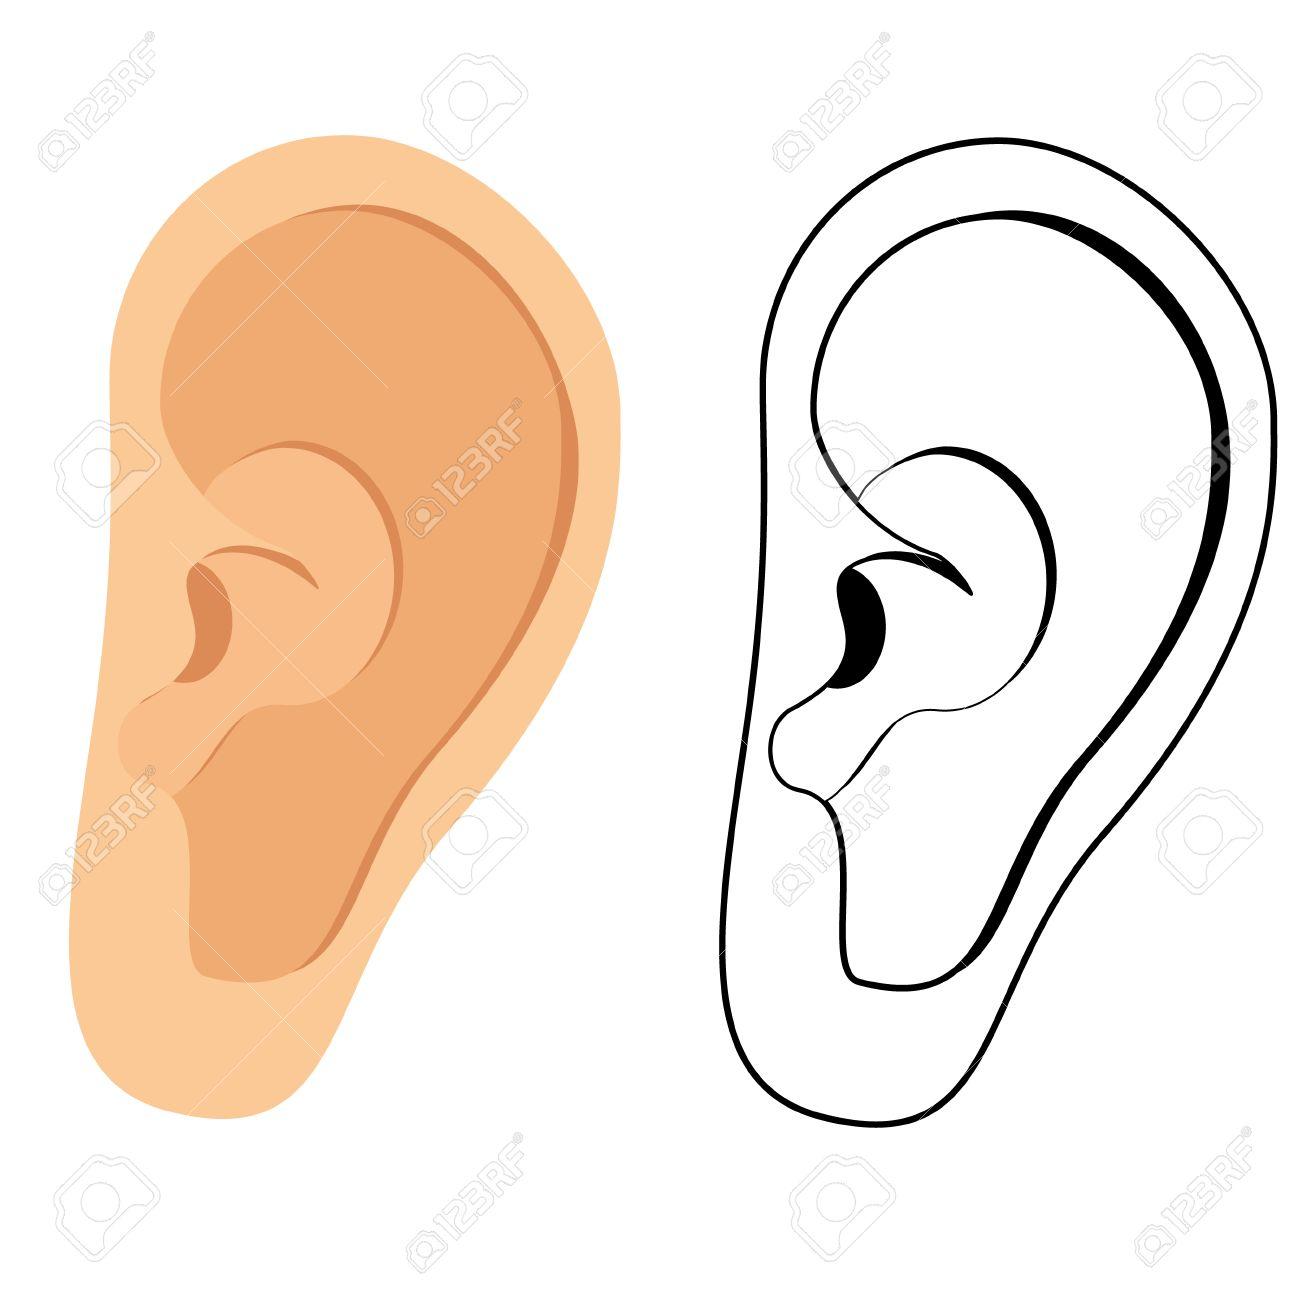 Vector illustration of human ear. Ear icon, symbol. Deaf, ear hearing - 45908375